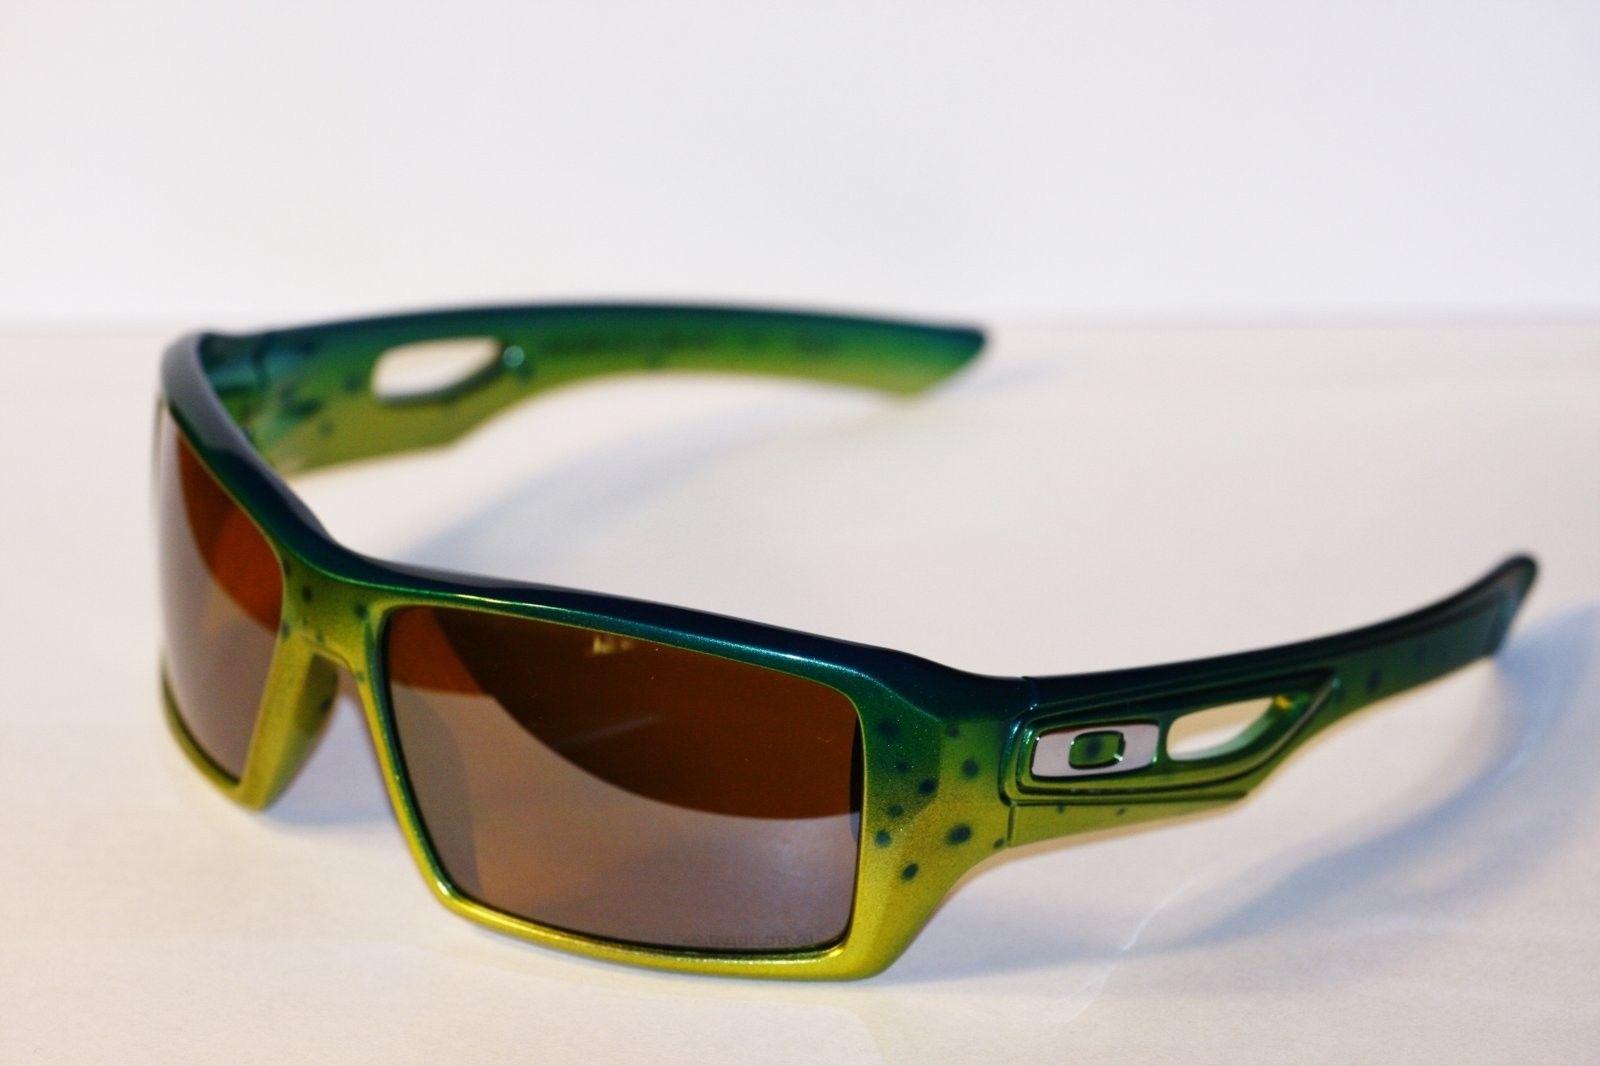 Dr. Chop Custom EyePatch 2 Price Drop - Ferrari Carbon Blade, Robot, DR chop bagger 016.JPG